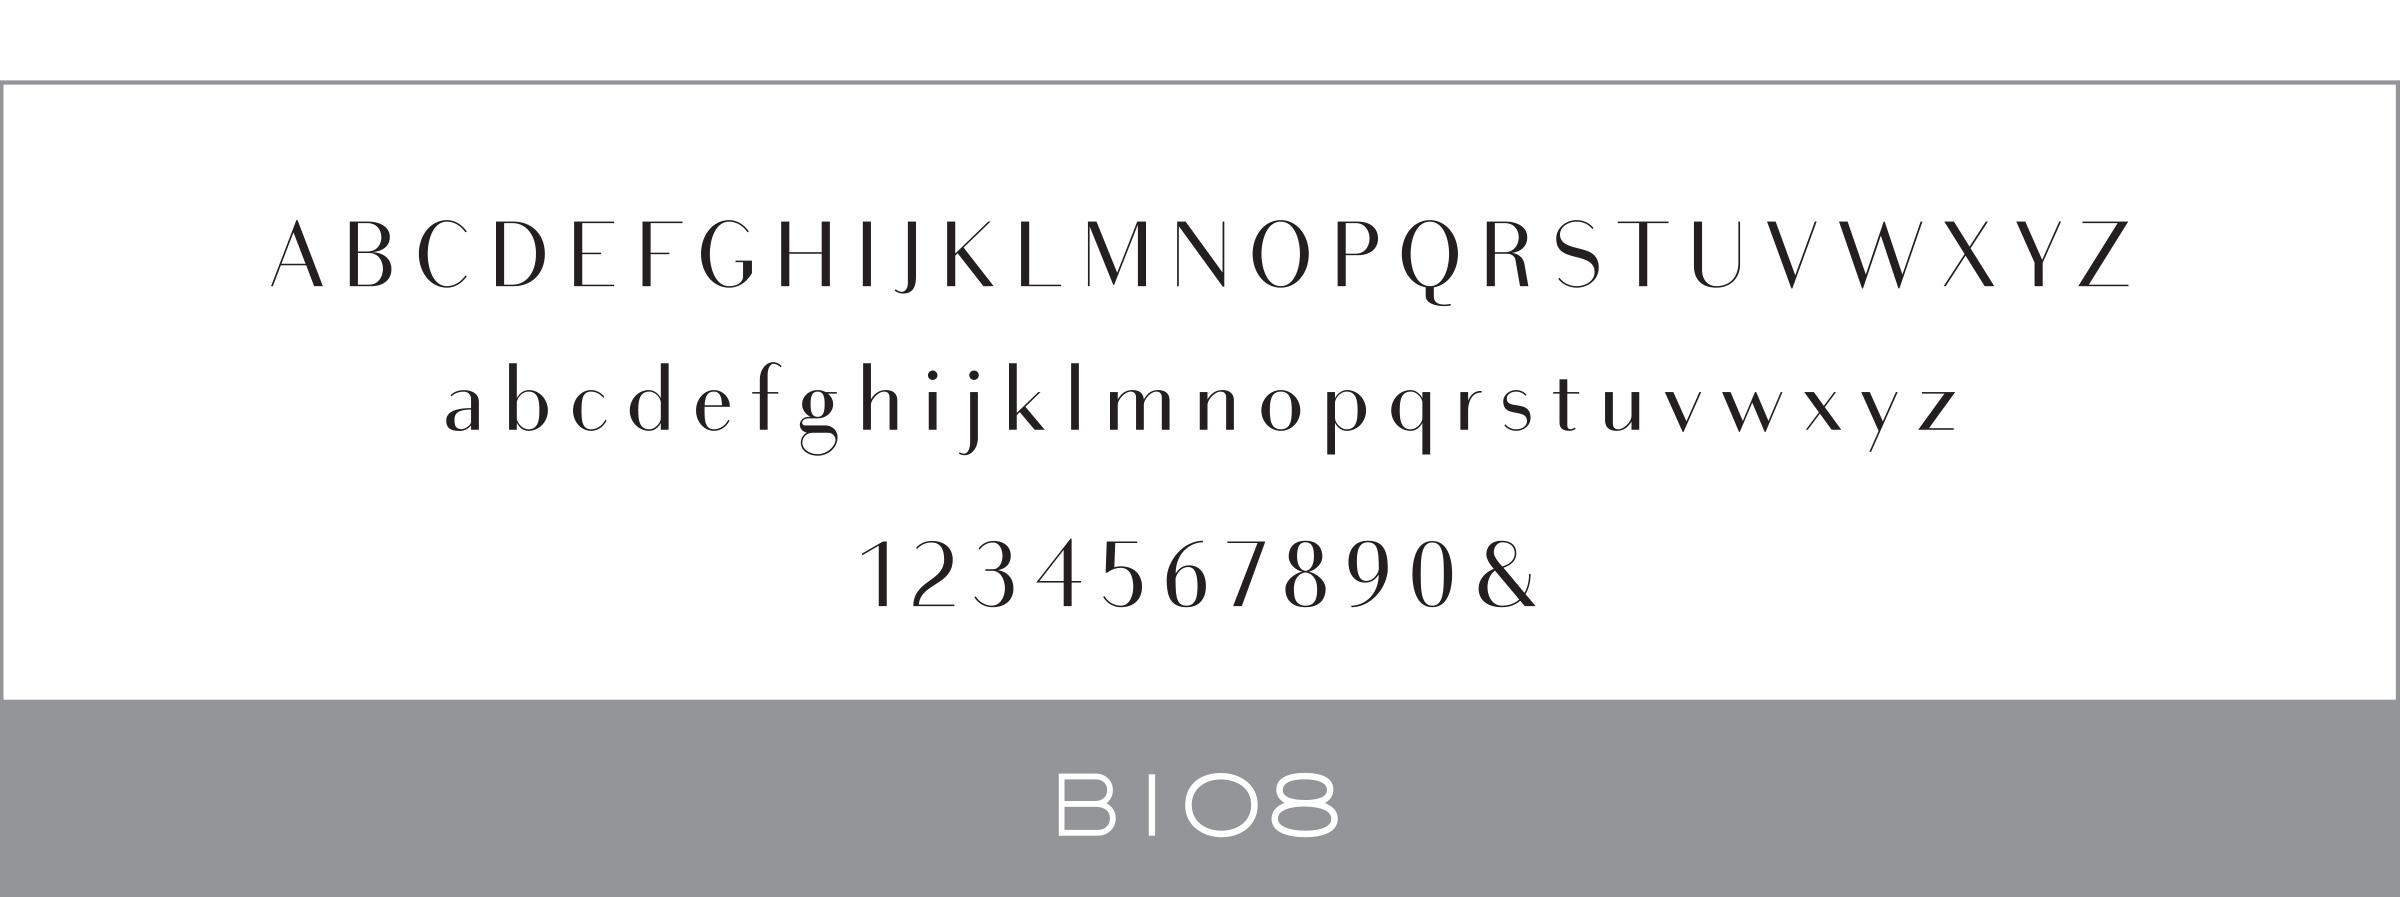 B108_Haute_Papier_Font.jpg